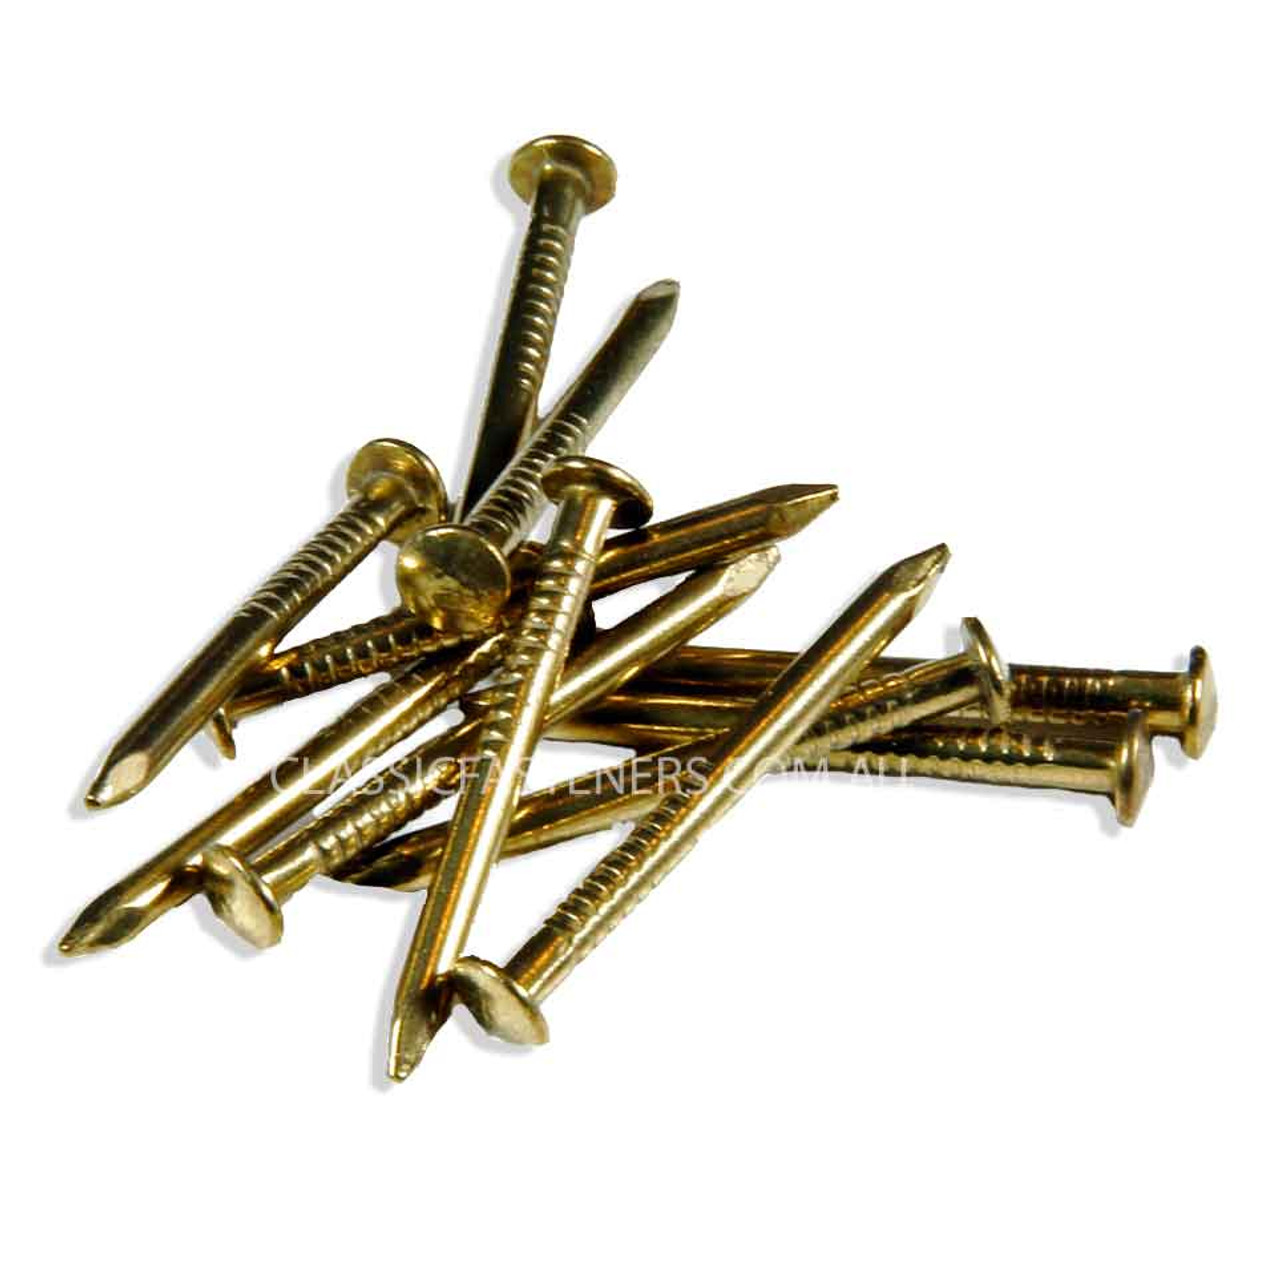 Brass Escutcheon Pins 17G x 3/8